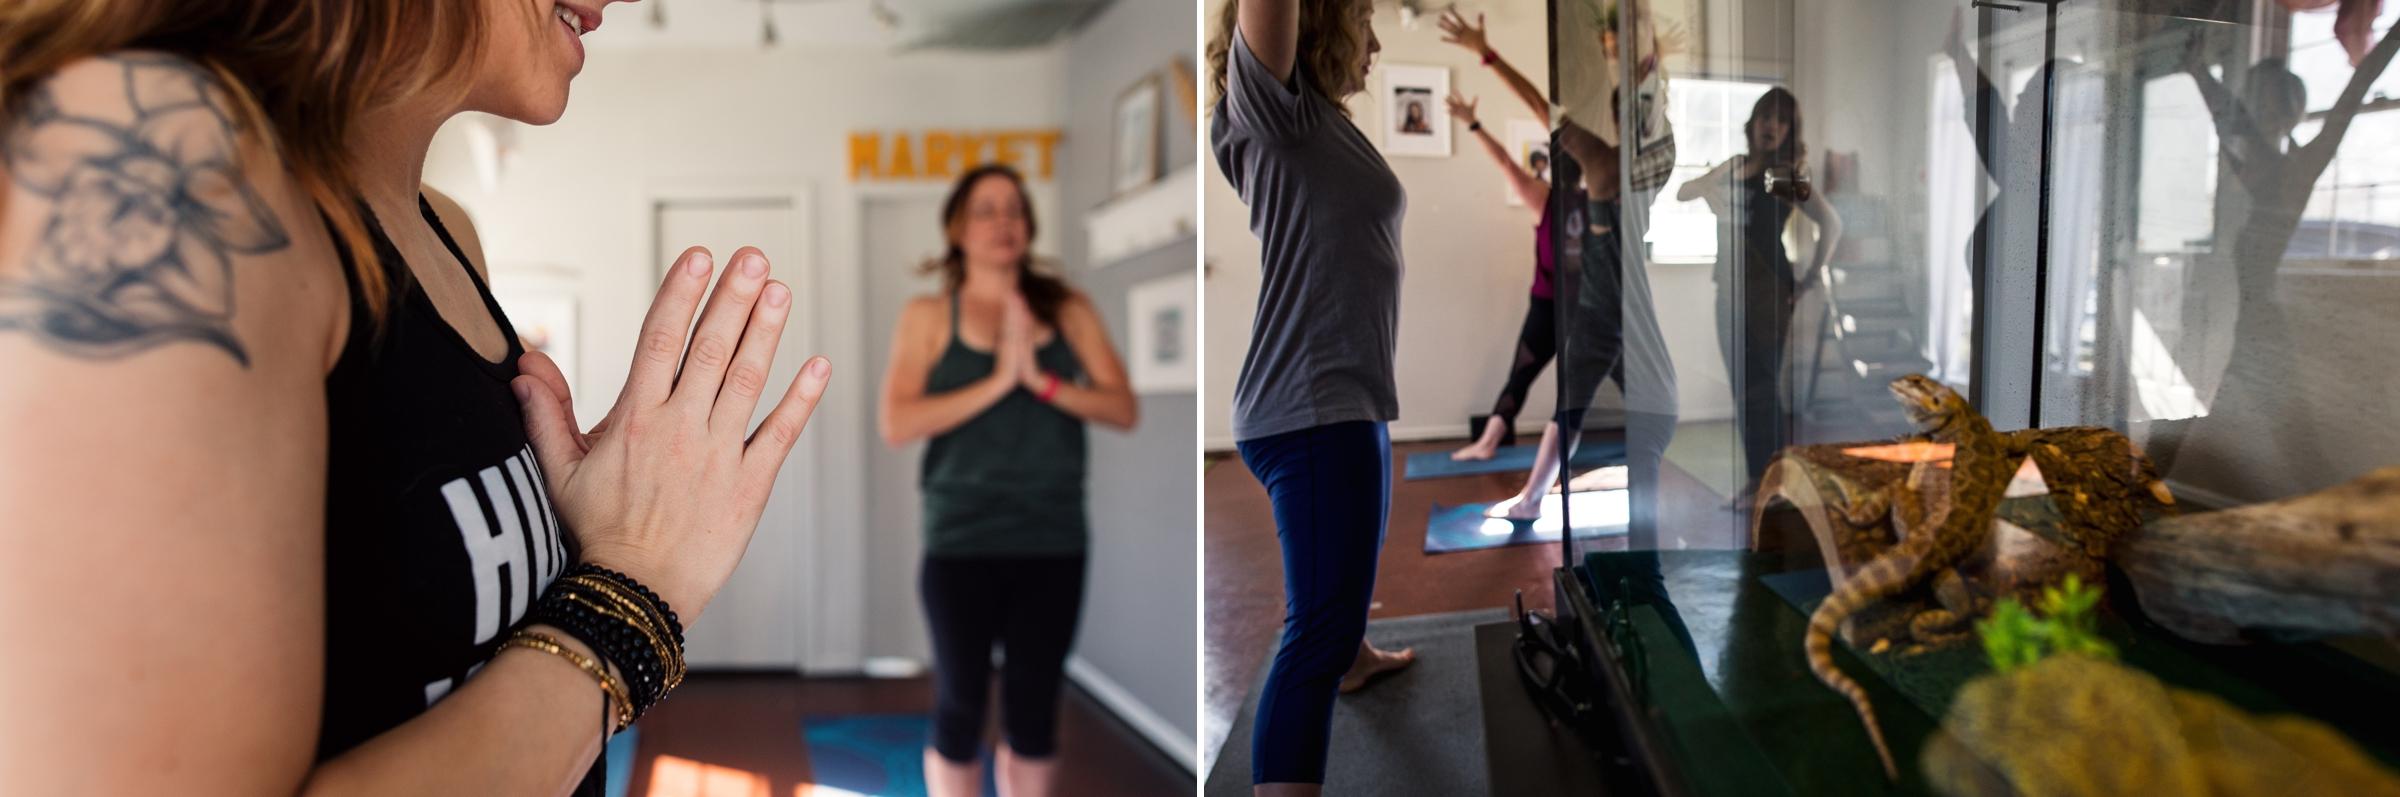 colorado springs yoga studio, denver yoga studio, colorado headshot photographer